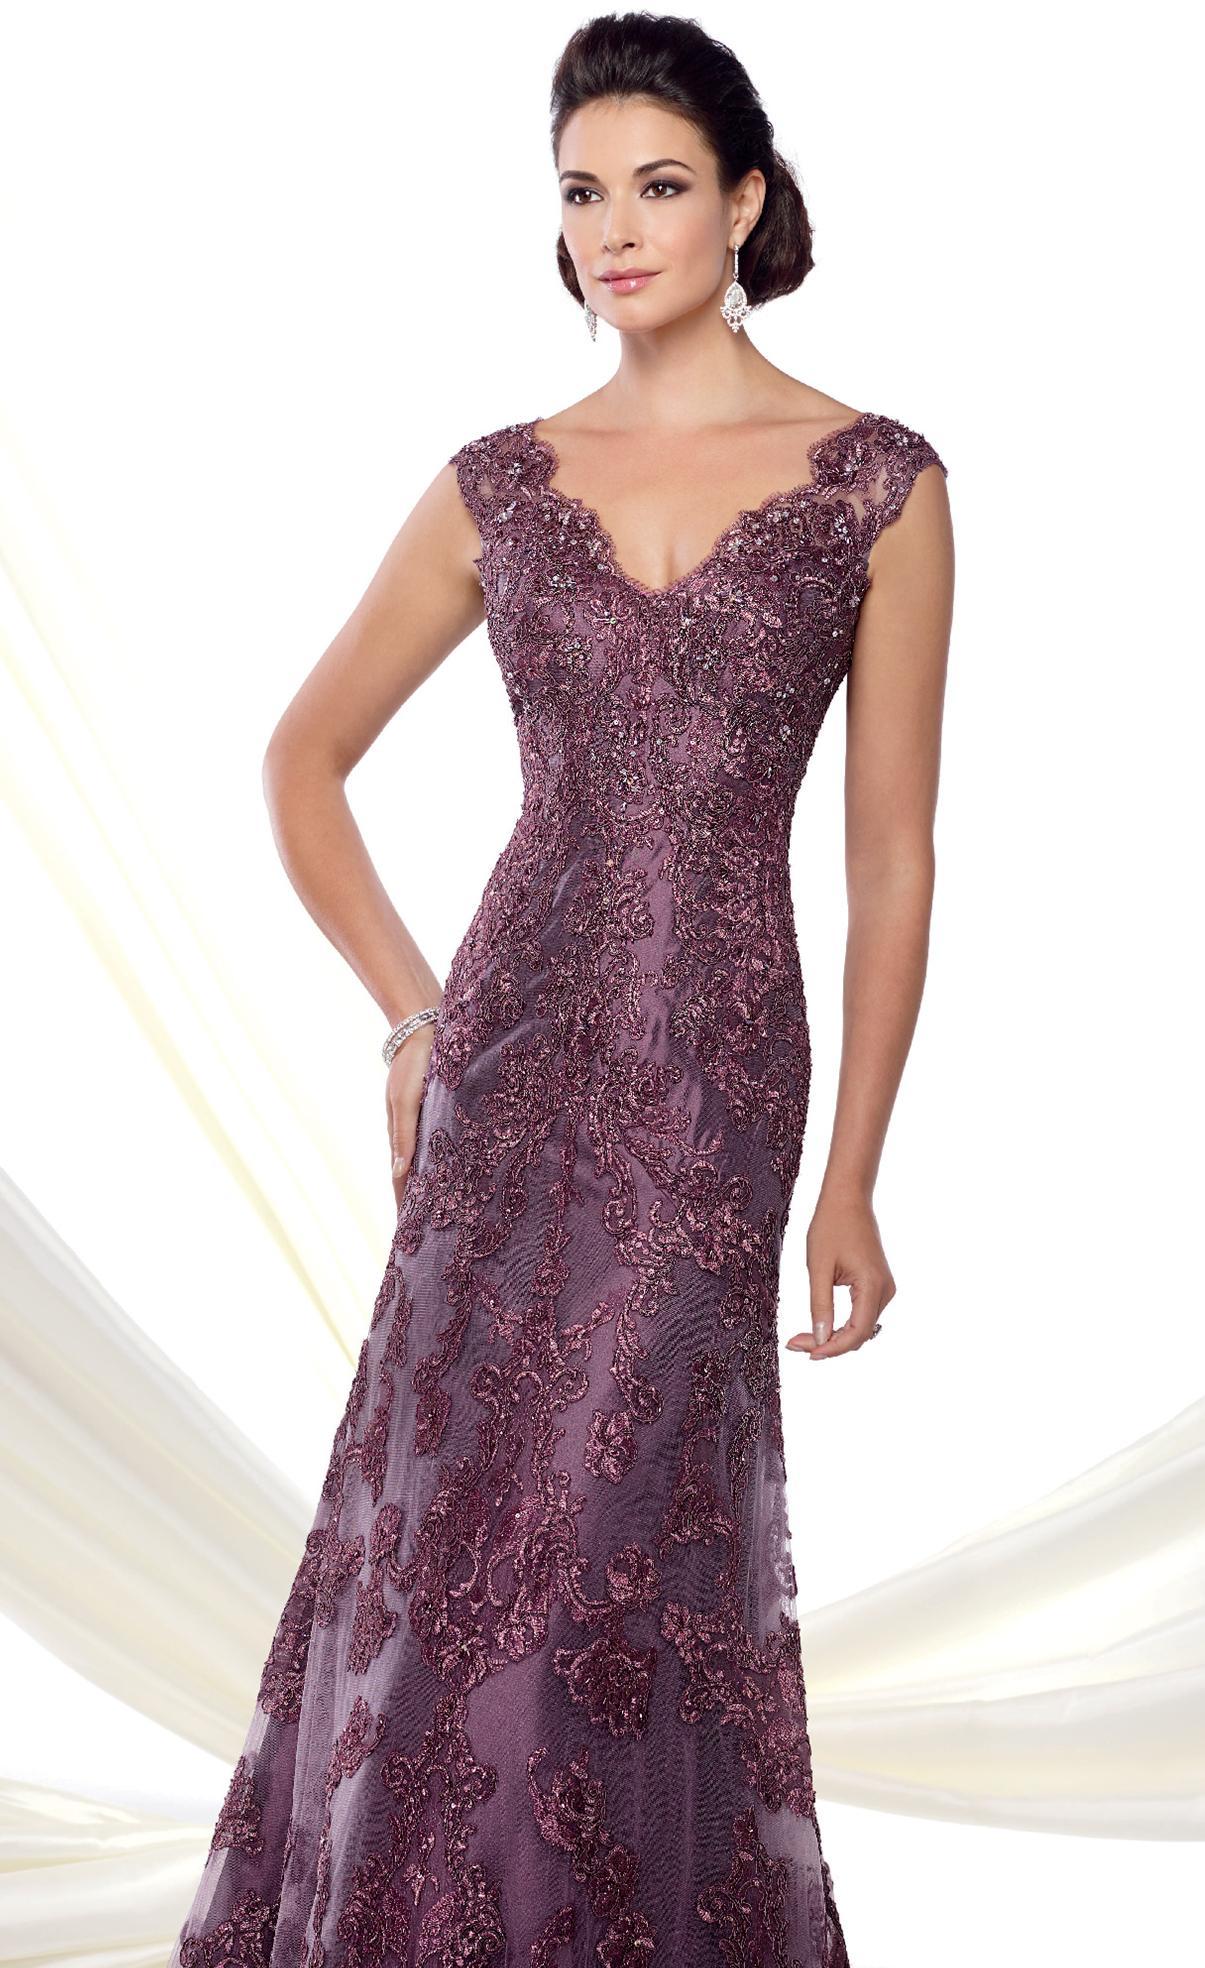 Best Bridal Gowns Albuquerque Contemporary - Wedding Dresses for ...